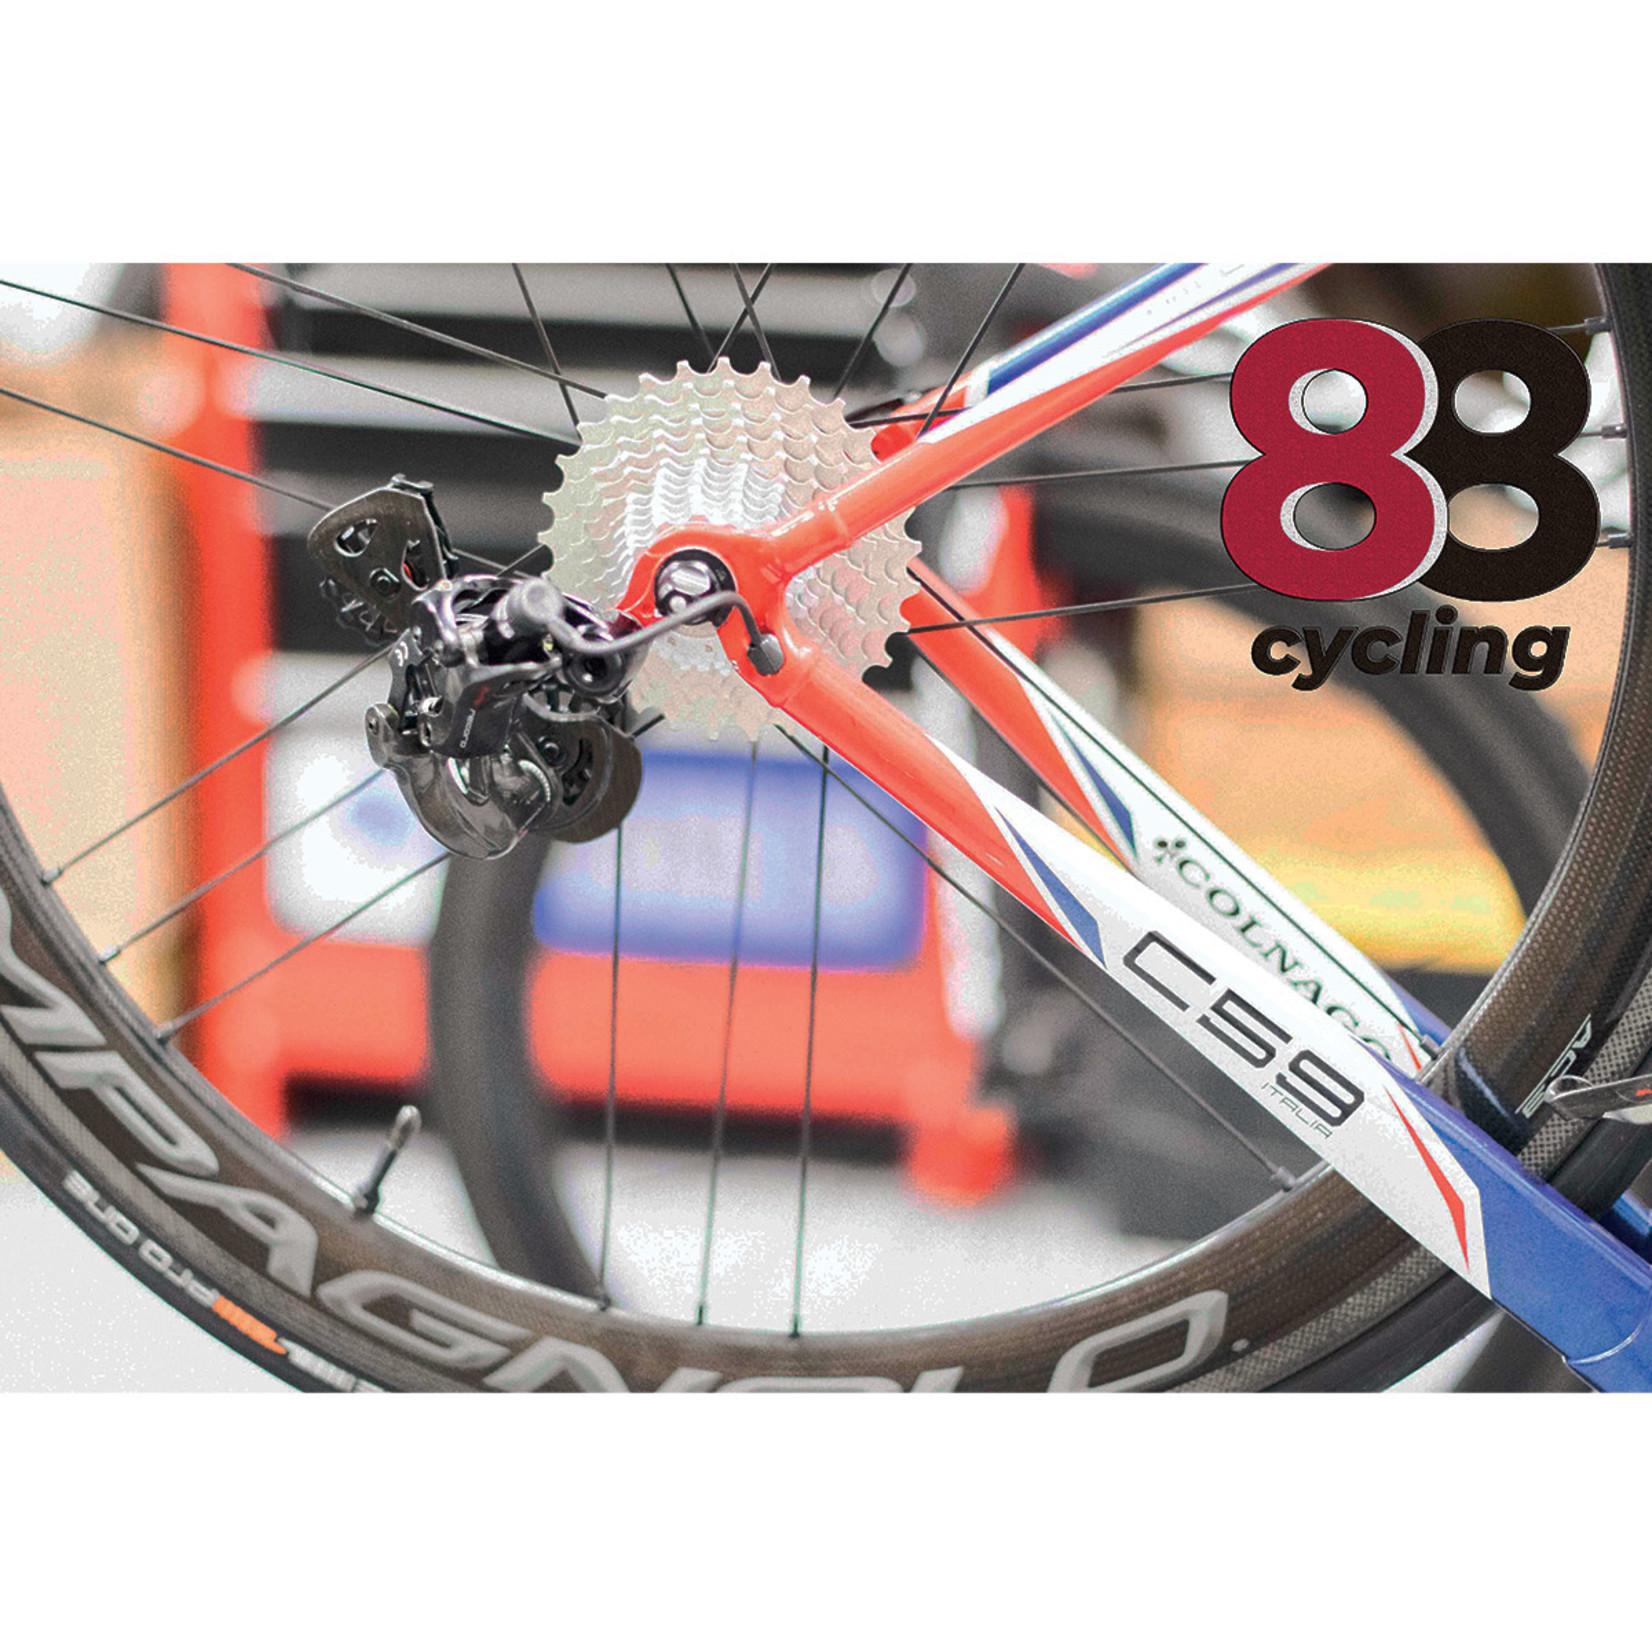 88 Cycling XPRESS TUNE UP